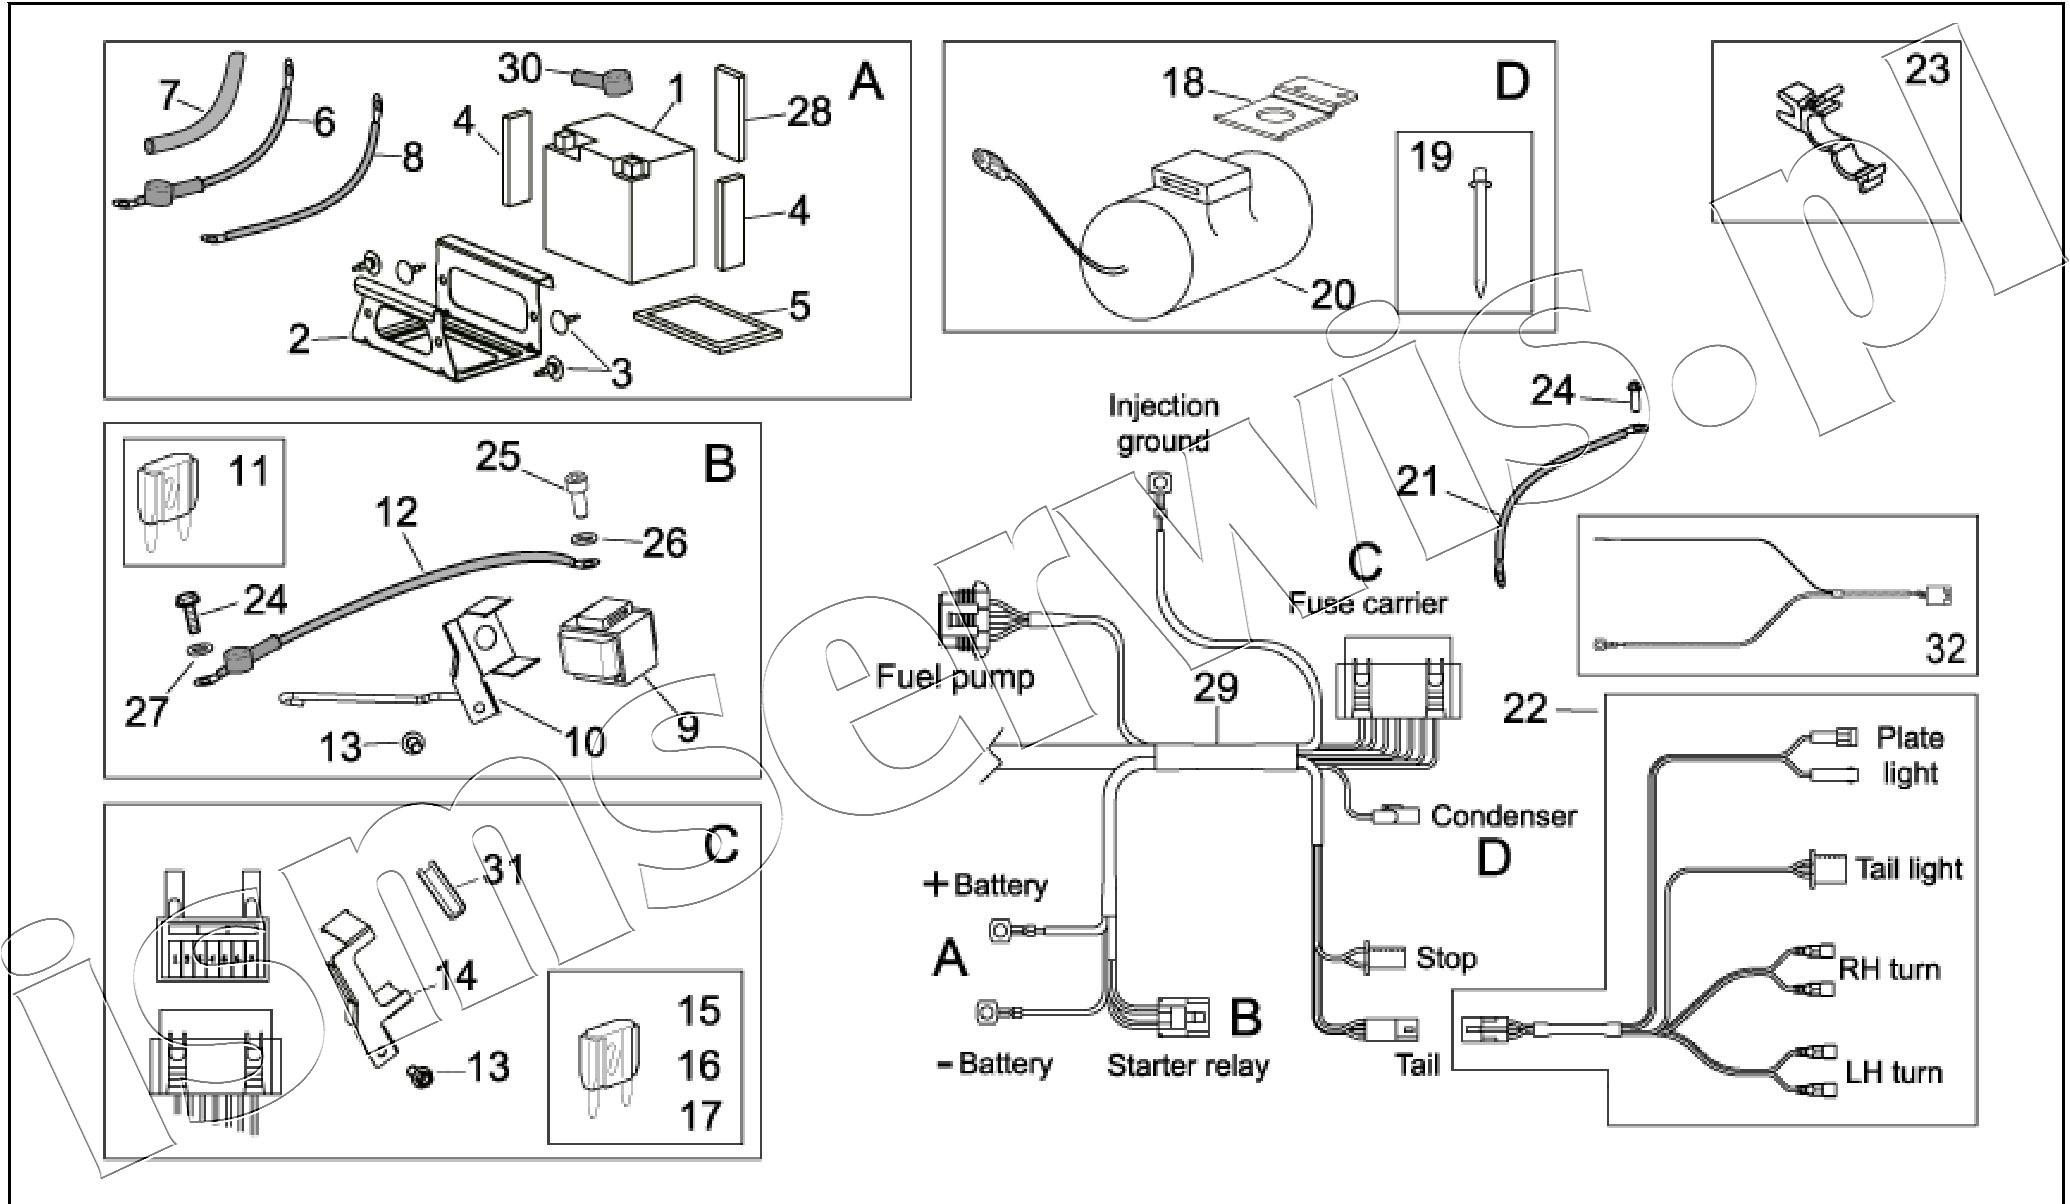 [DIAGRAM_34OR]  Aprilia Sxv 450 Wiring Diagram - Wiring Diagrams   Aprilia Sxv Wiring Diagram      mine.even.lesvignoblesguimberteau.fr